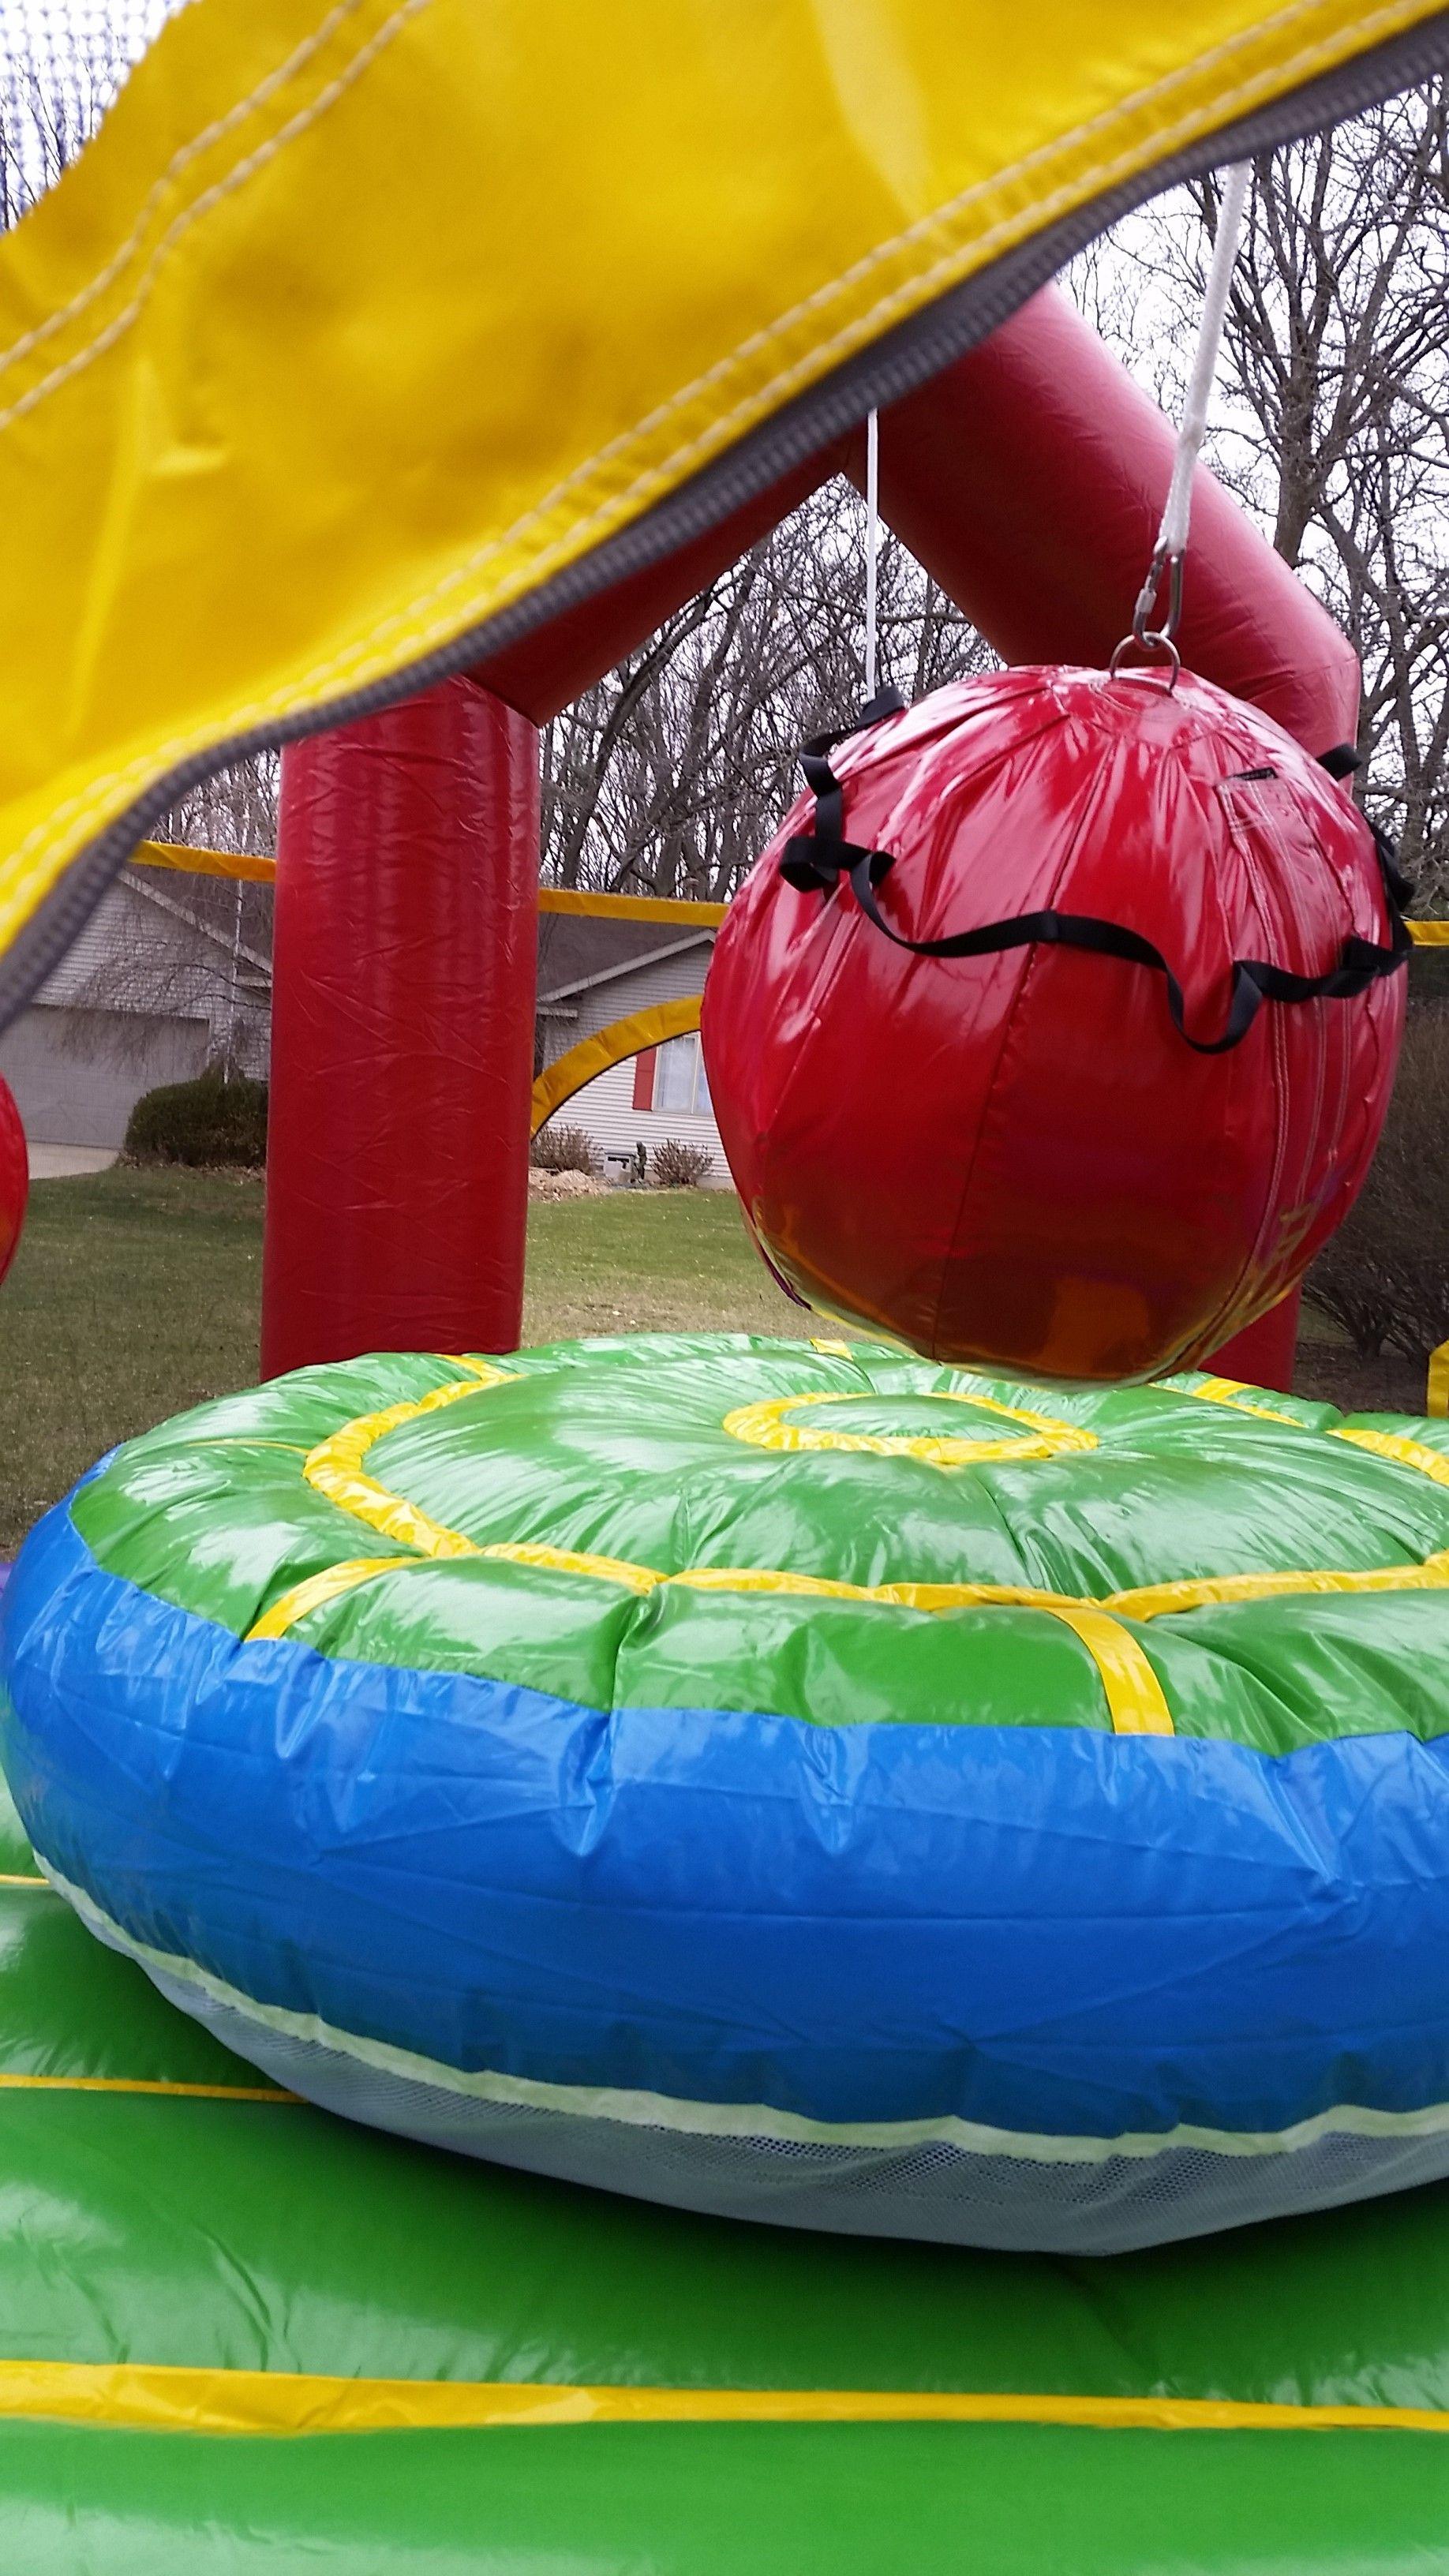 Wreaking Ball Michigan ohio, Grad parties, Michigan